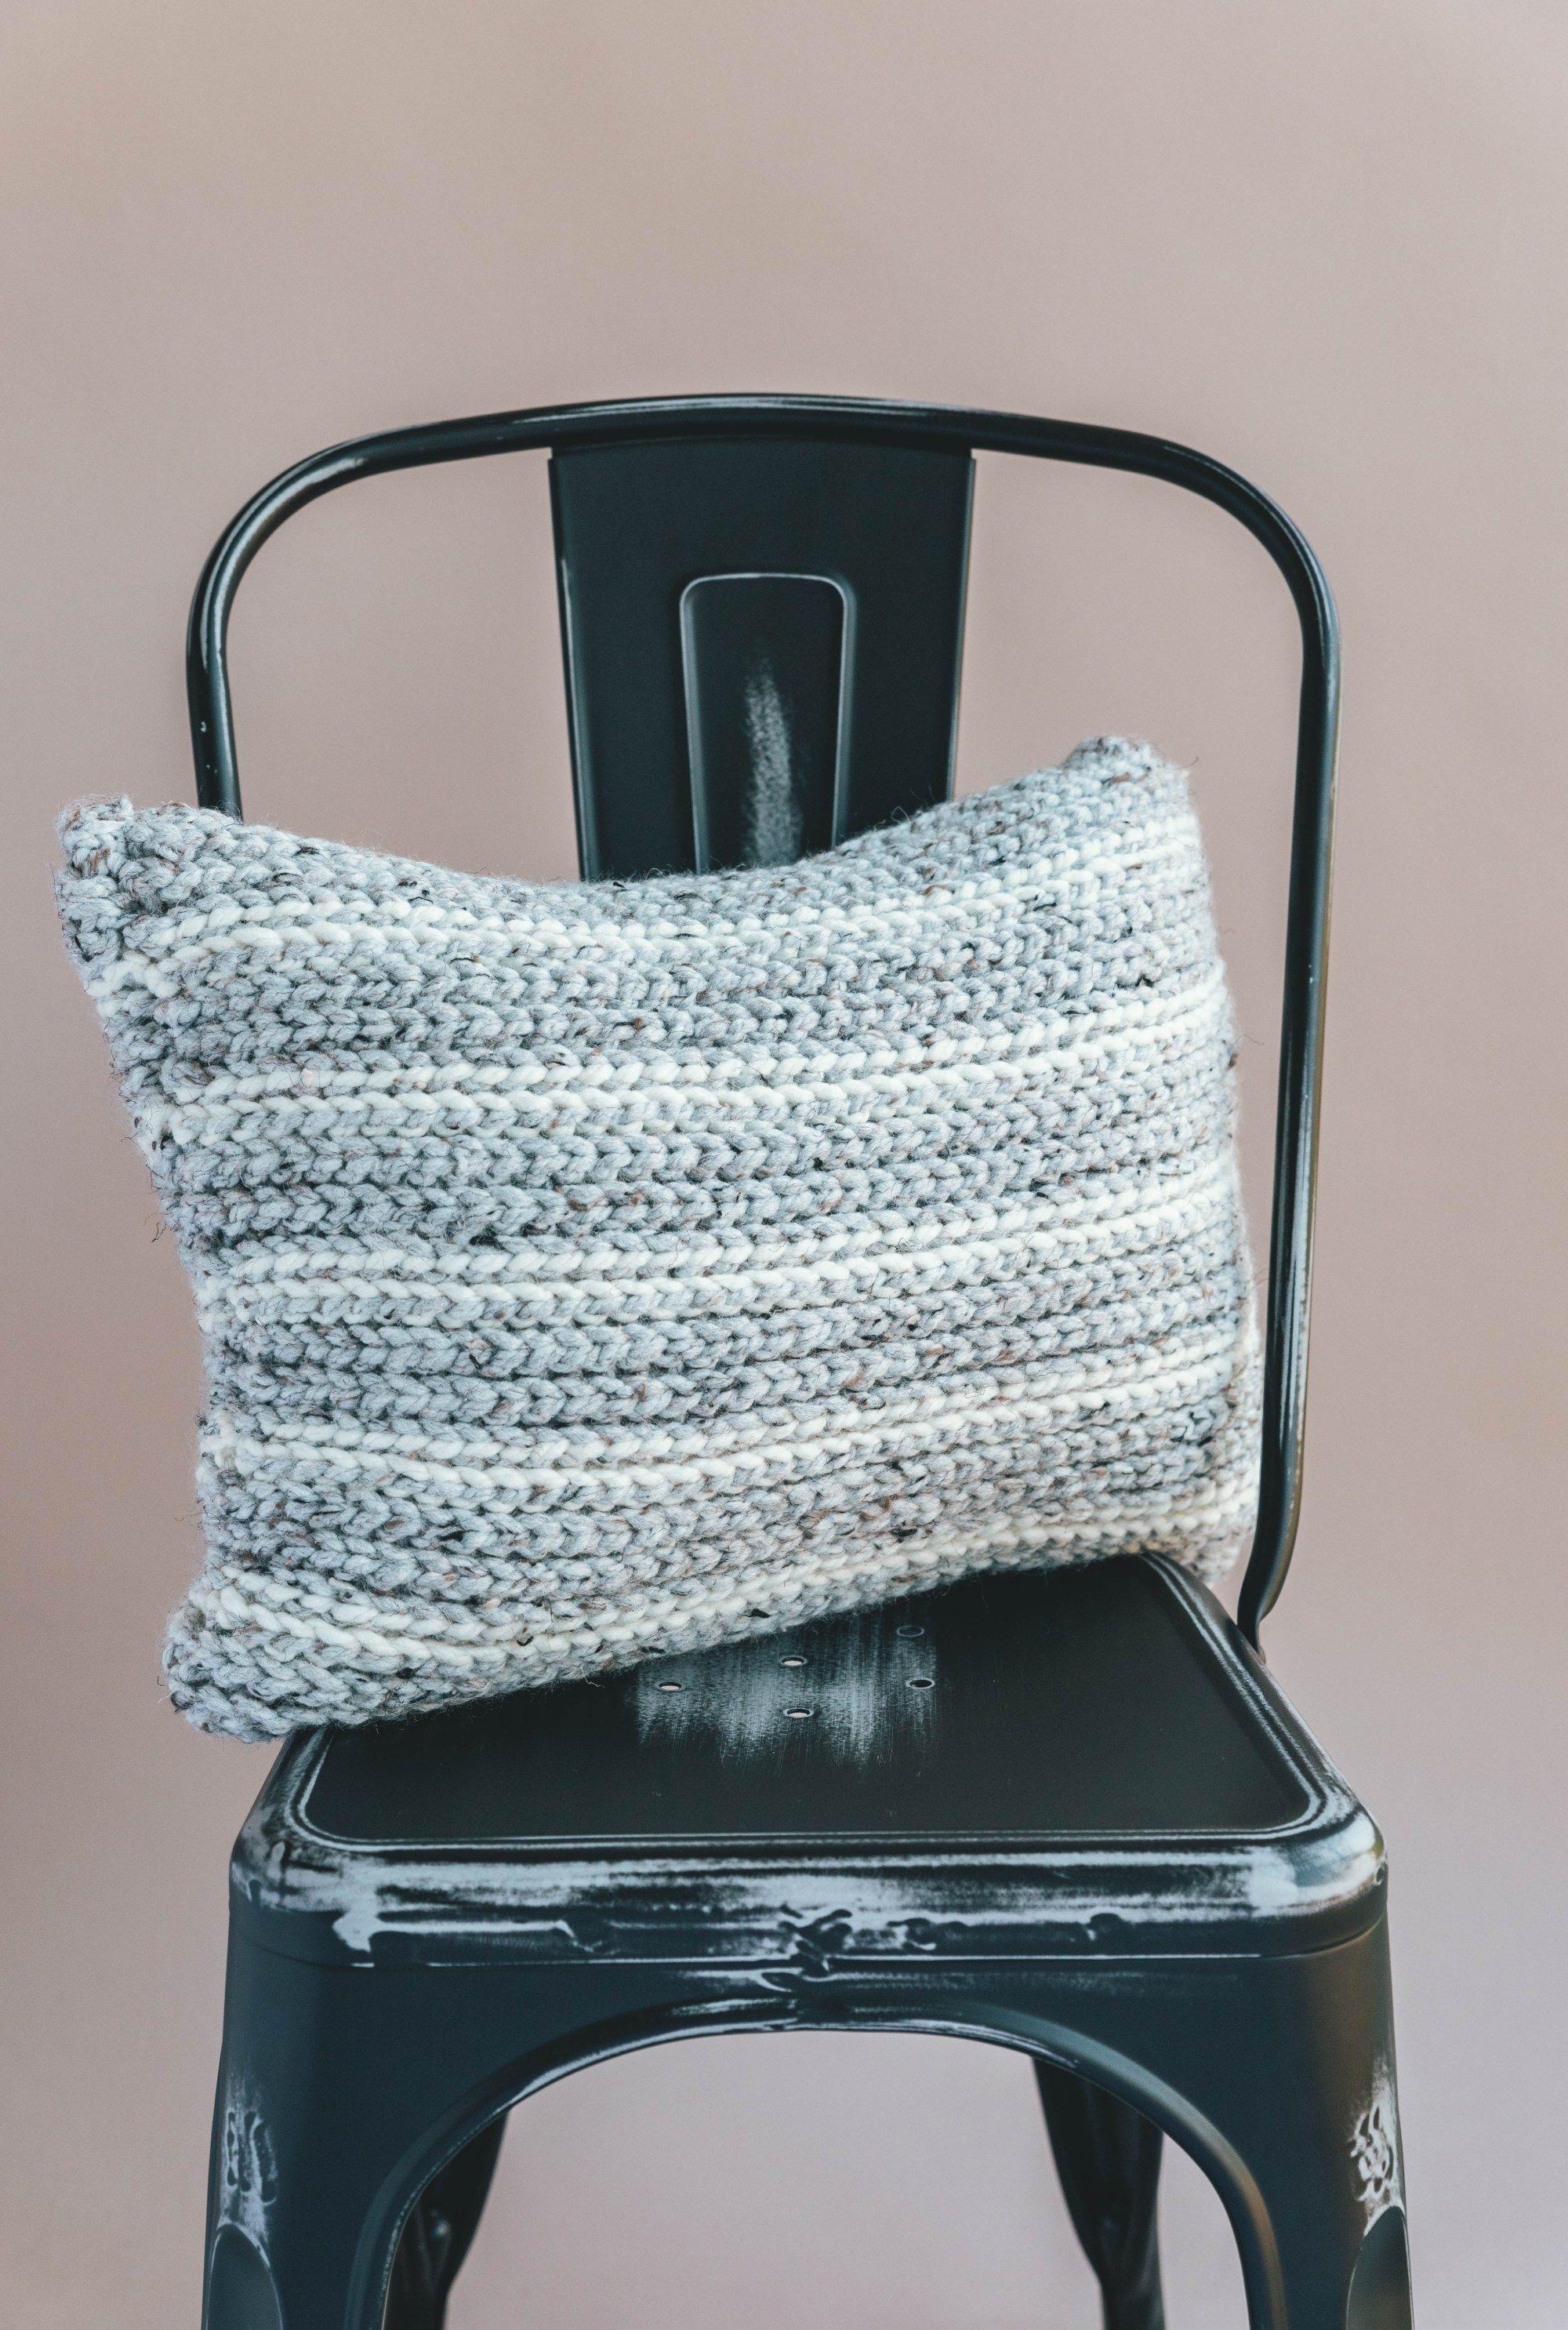 Crochet Knit Look Pillow (with Sierra | Crochet | Pinterest